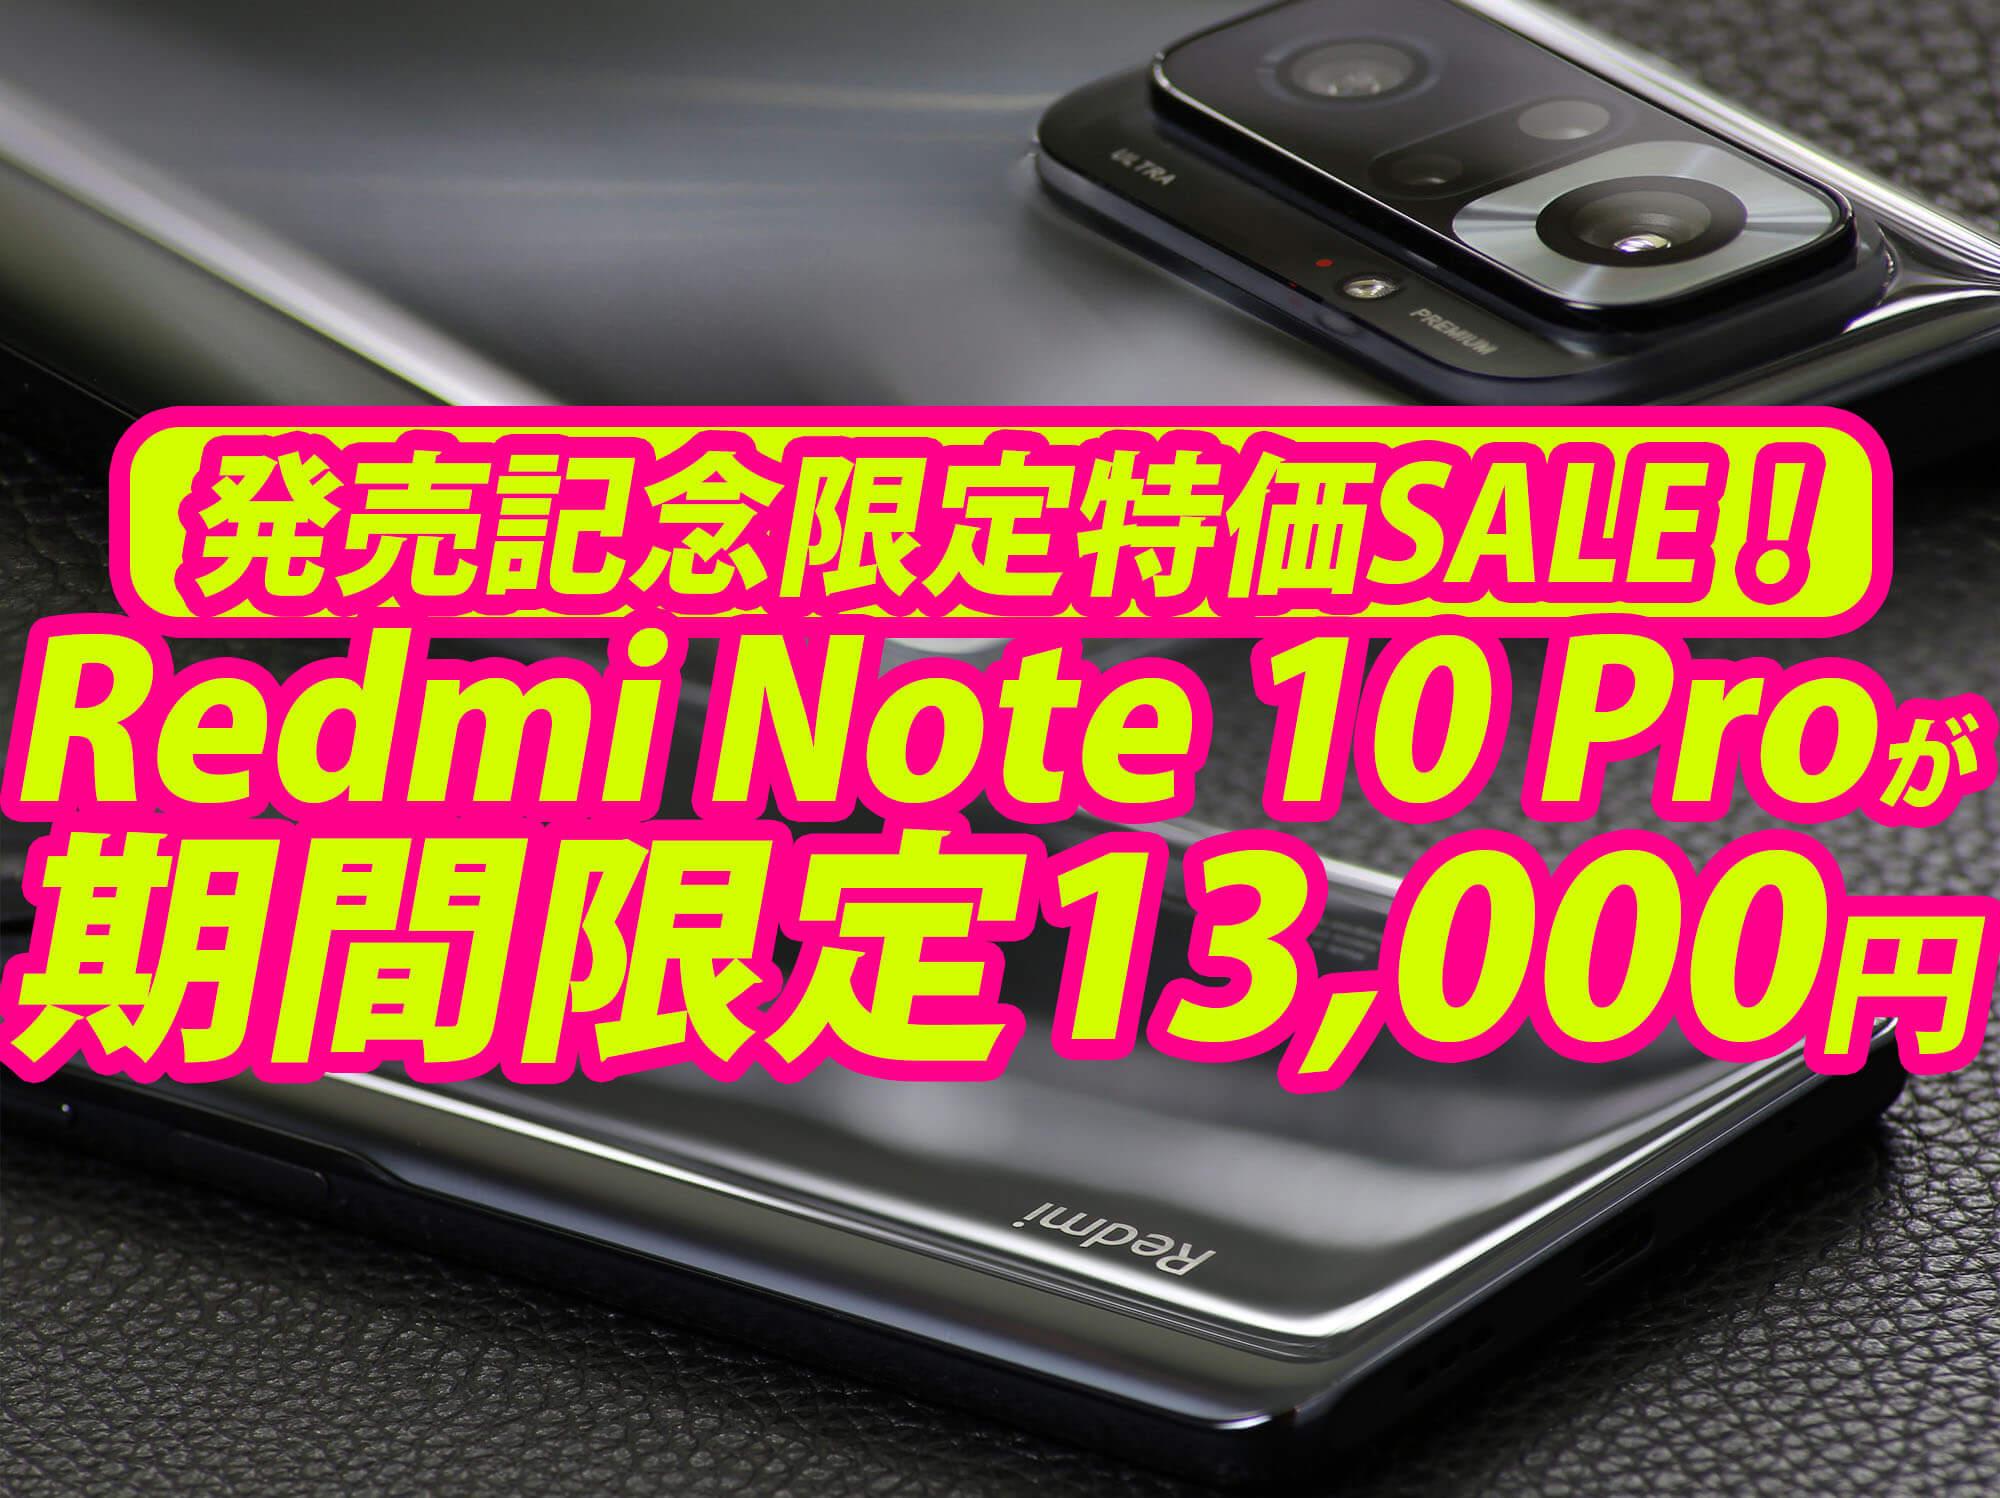 Redmi Note 10 Proが期間限定で1万3千円にプライスダウン!